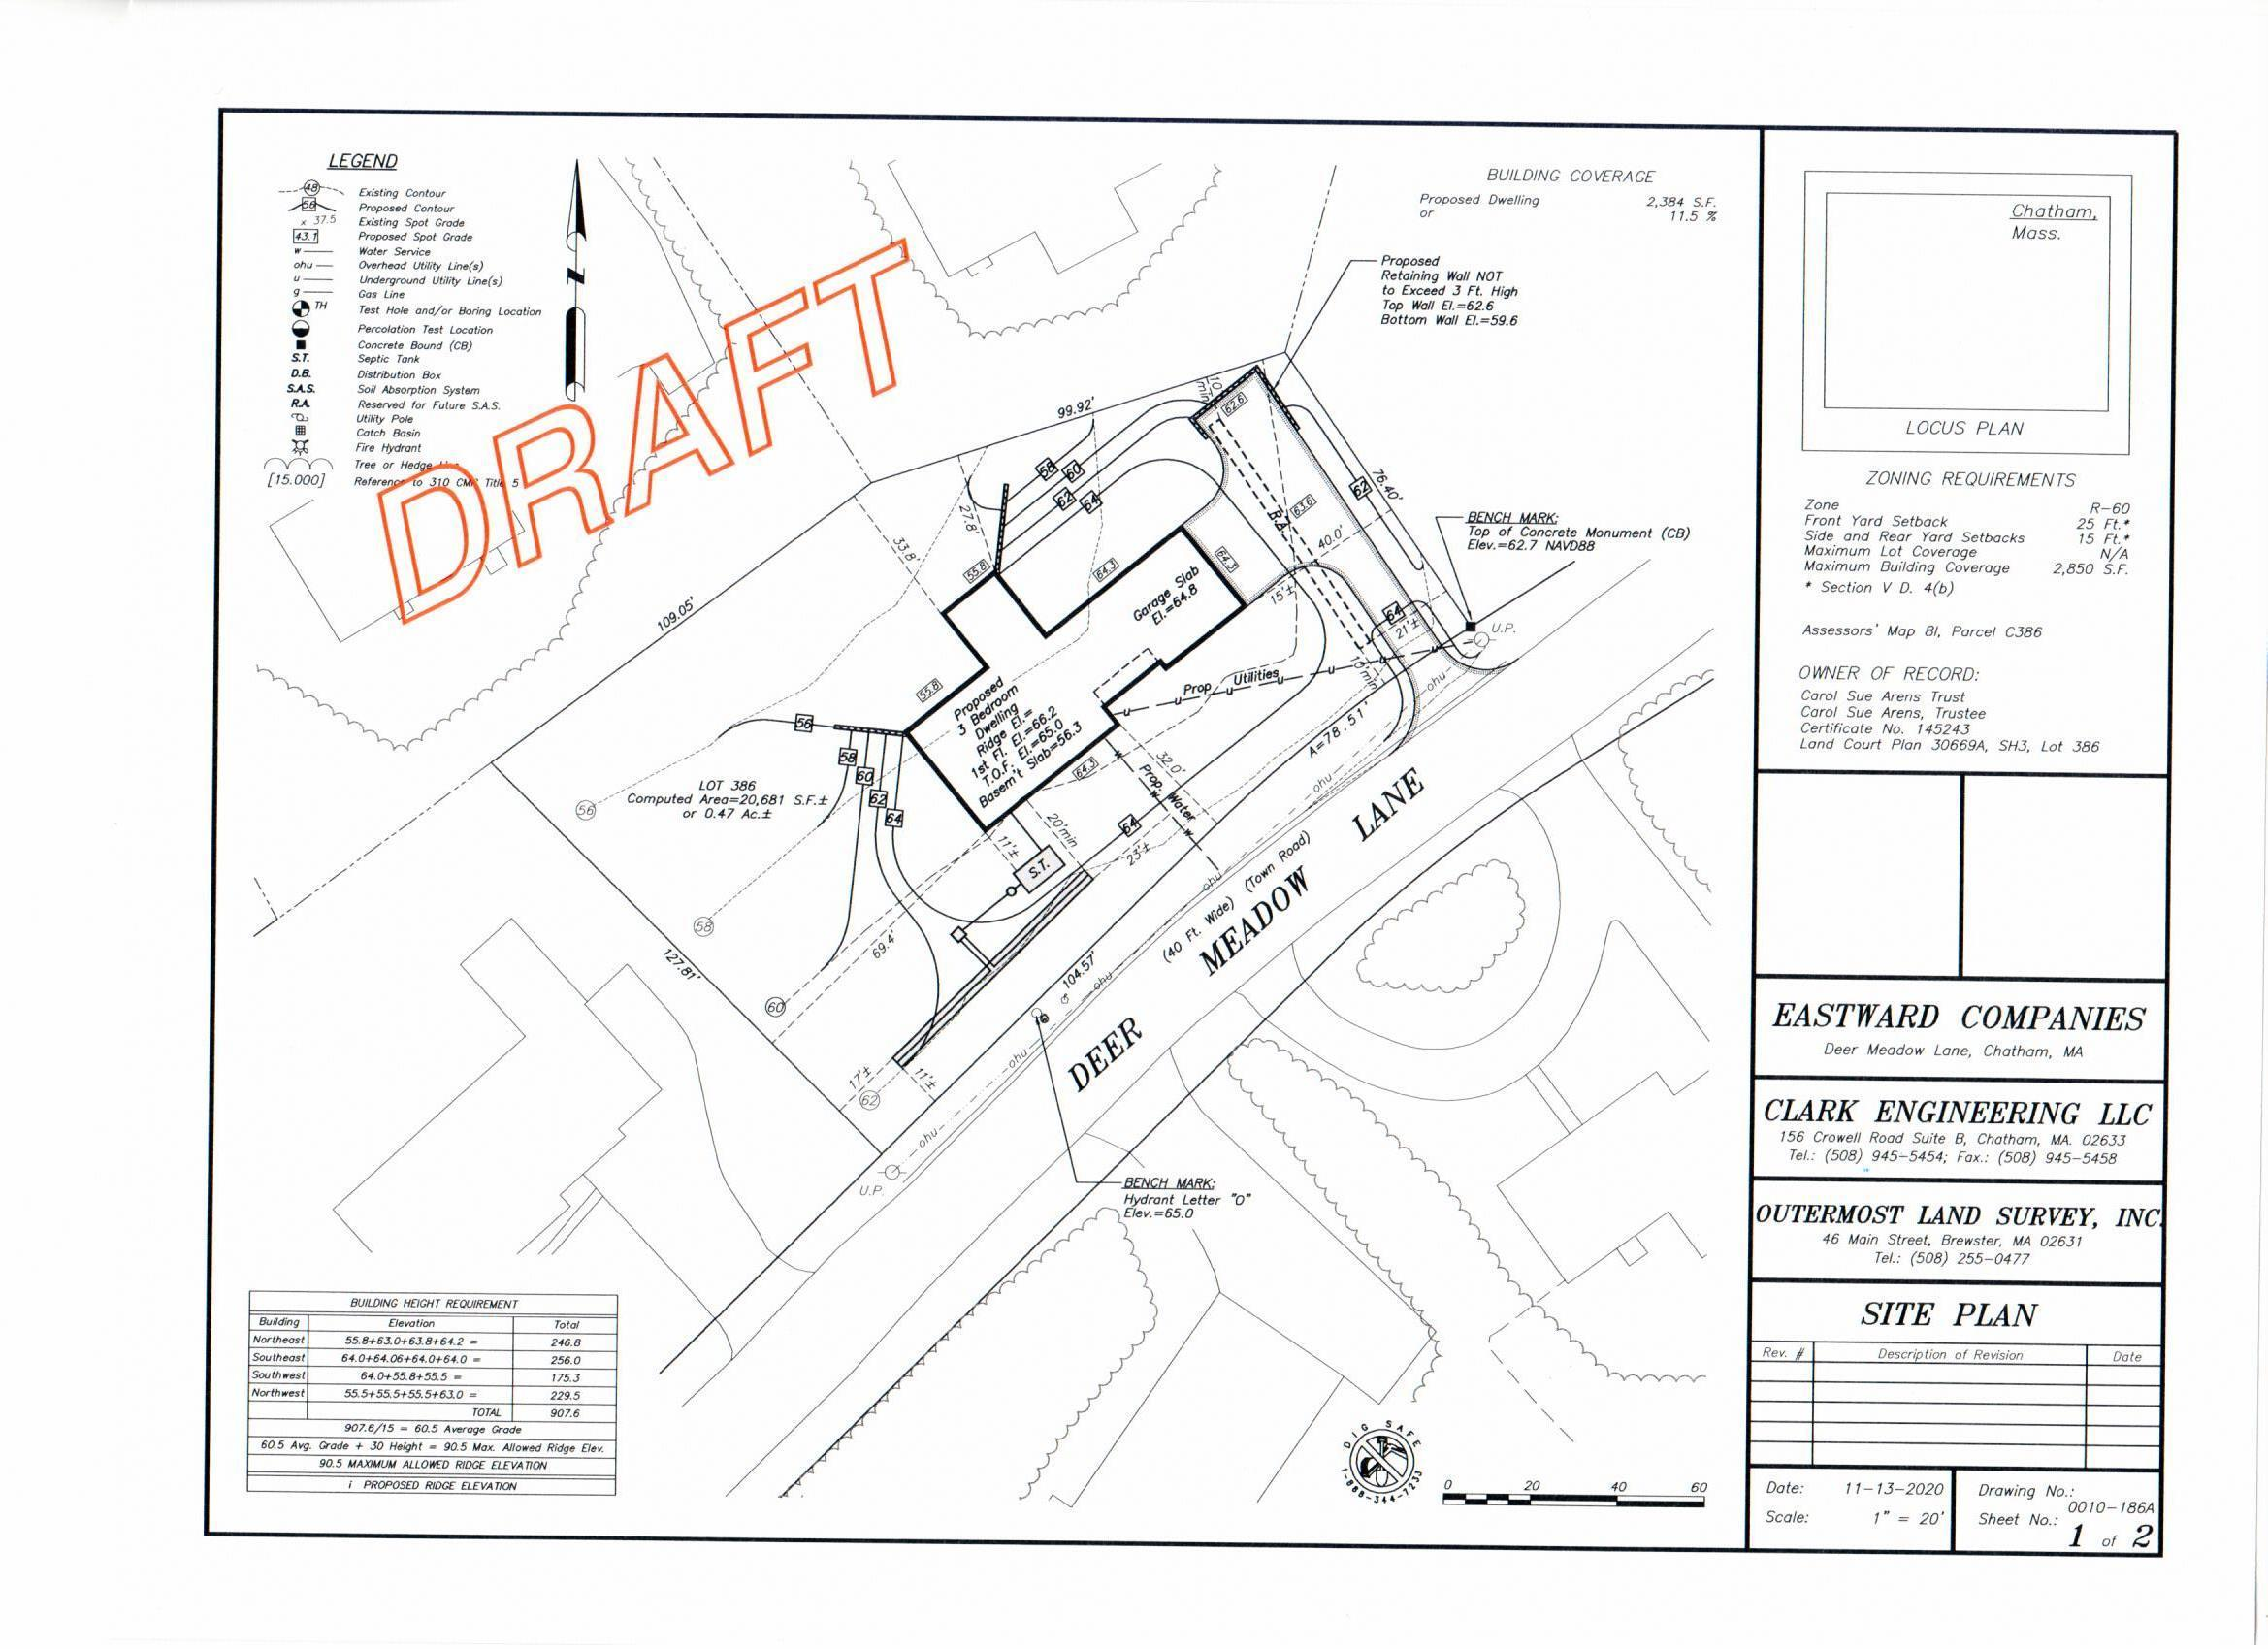 91 Deer Meadow Lane, Chatham, MA  02633 - slide 27